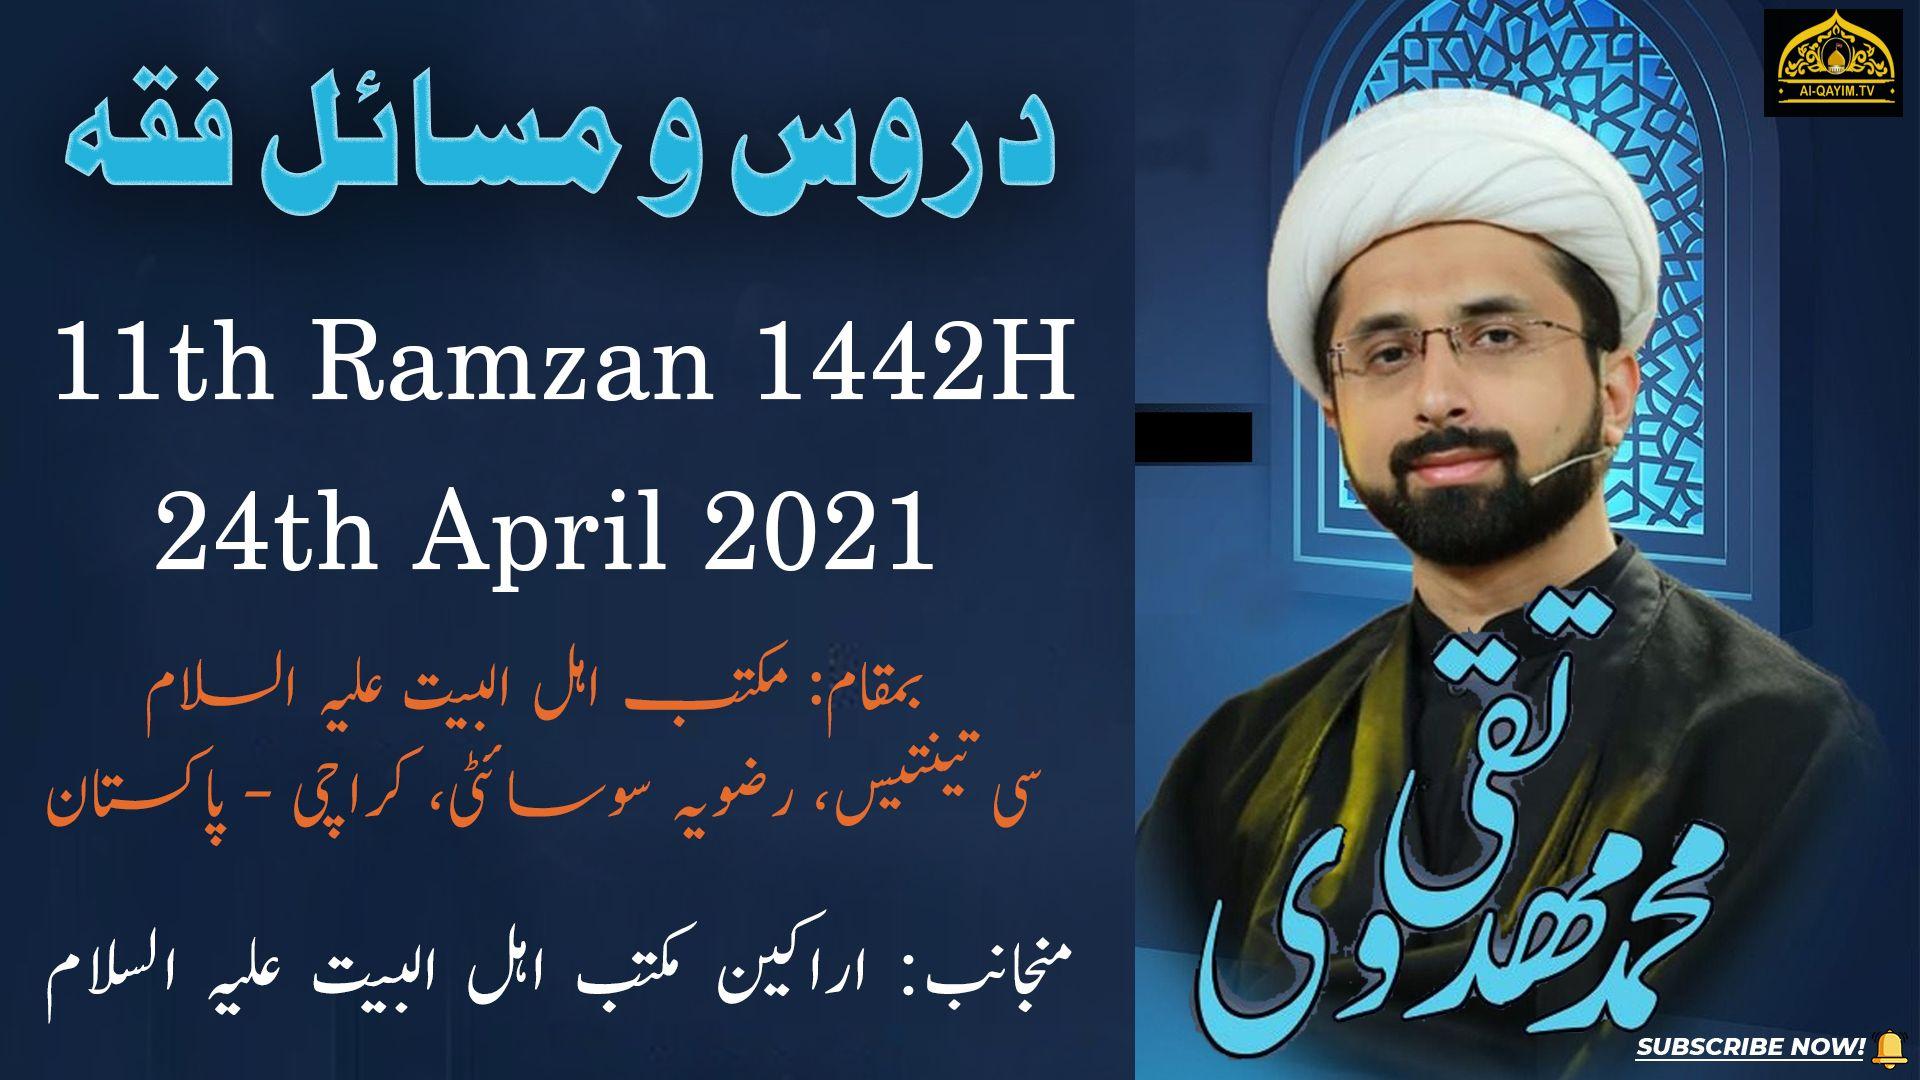 Moulana Muhammad Taqi Mehdavi | Dars Wo Masail Fiqae | 11th Ramzan 2021 | Maktab-e-Ahlebait, Karachi